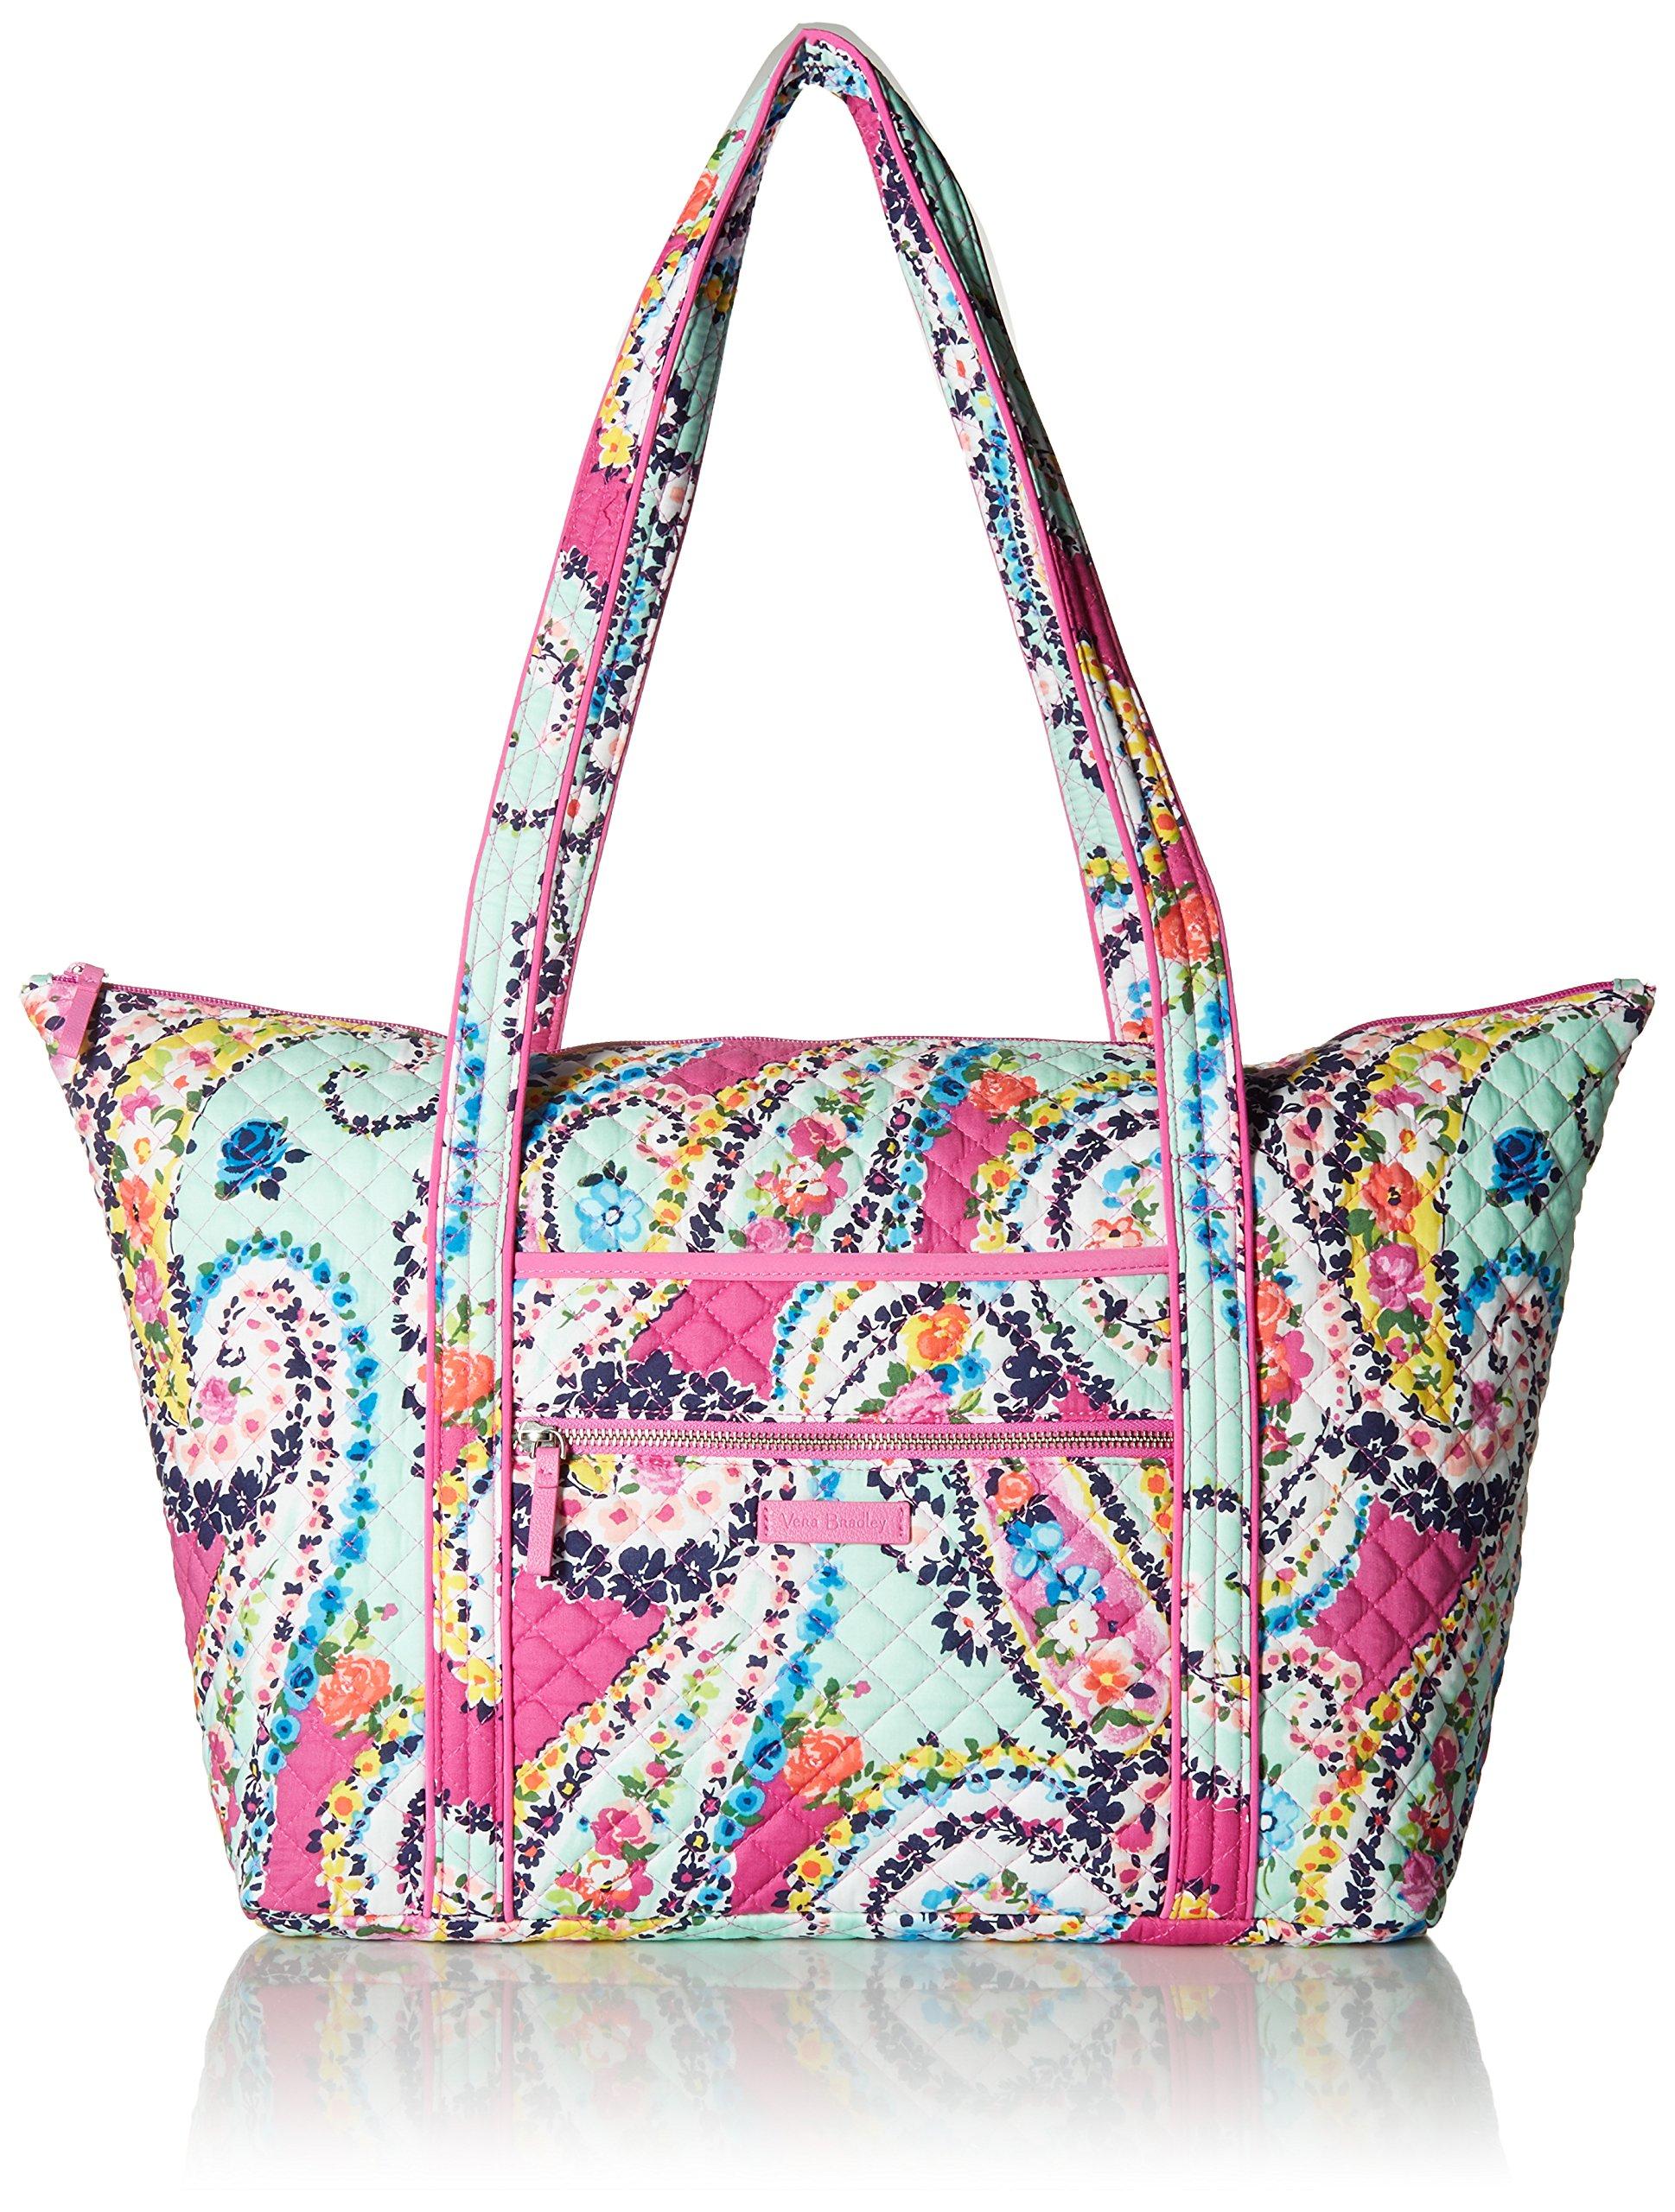 Vera Bradley Iconic Miller Travel Bag, Signature Cotton, Wildflower Paisley